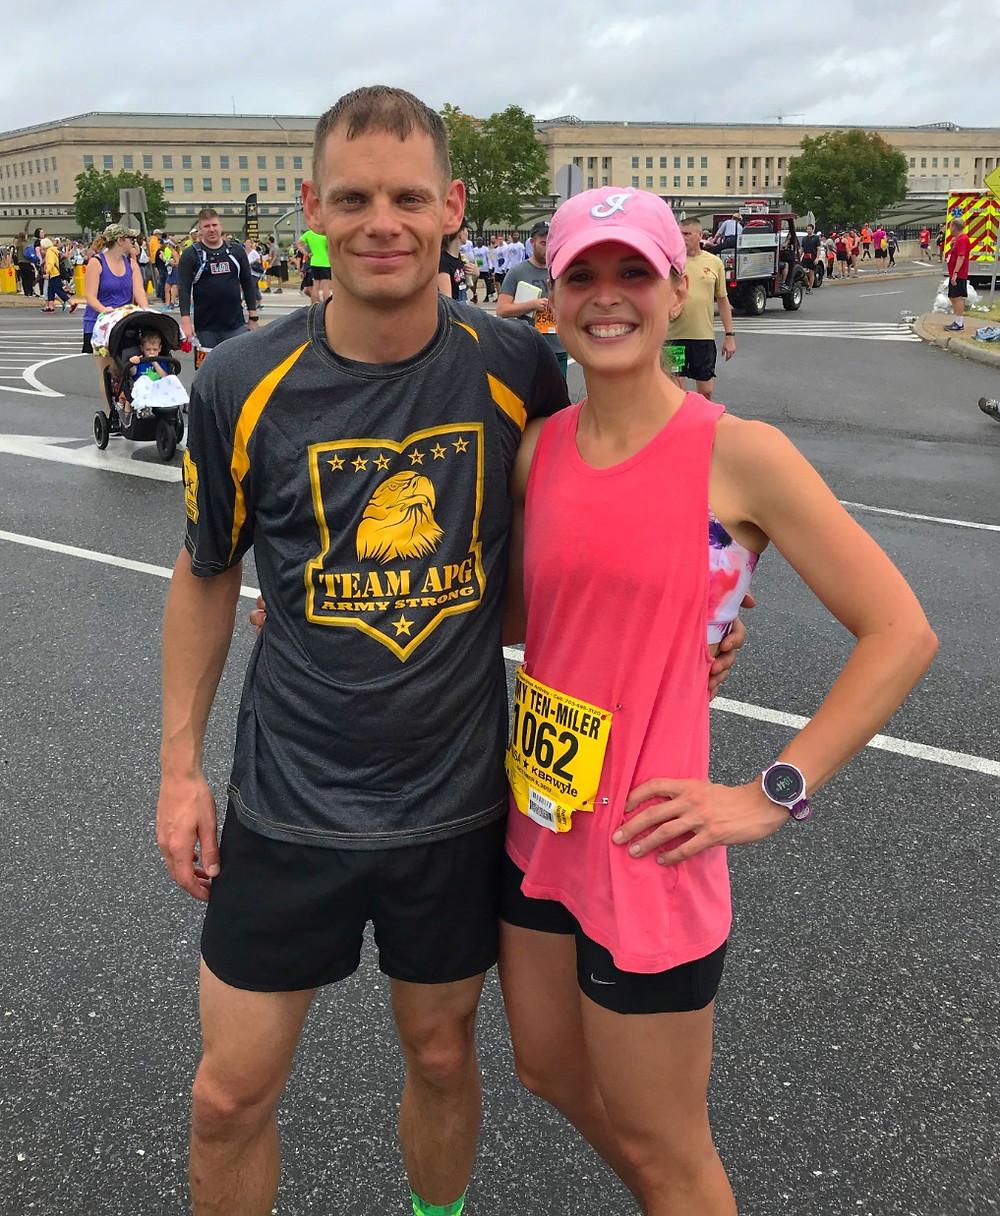 Man and woman runner at Army Ten Miler